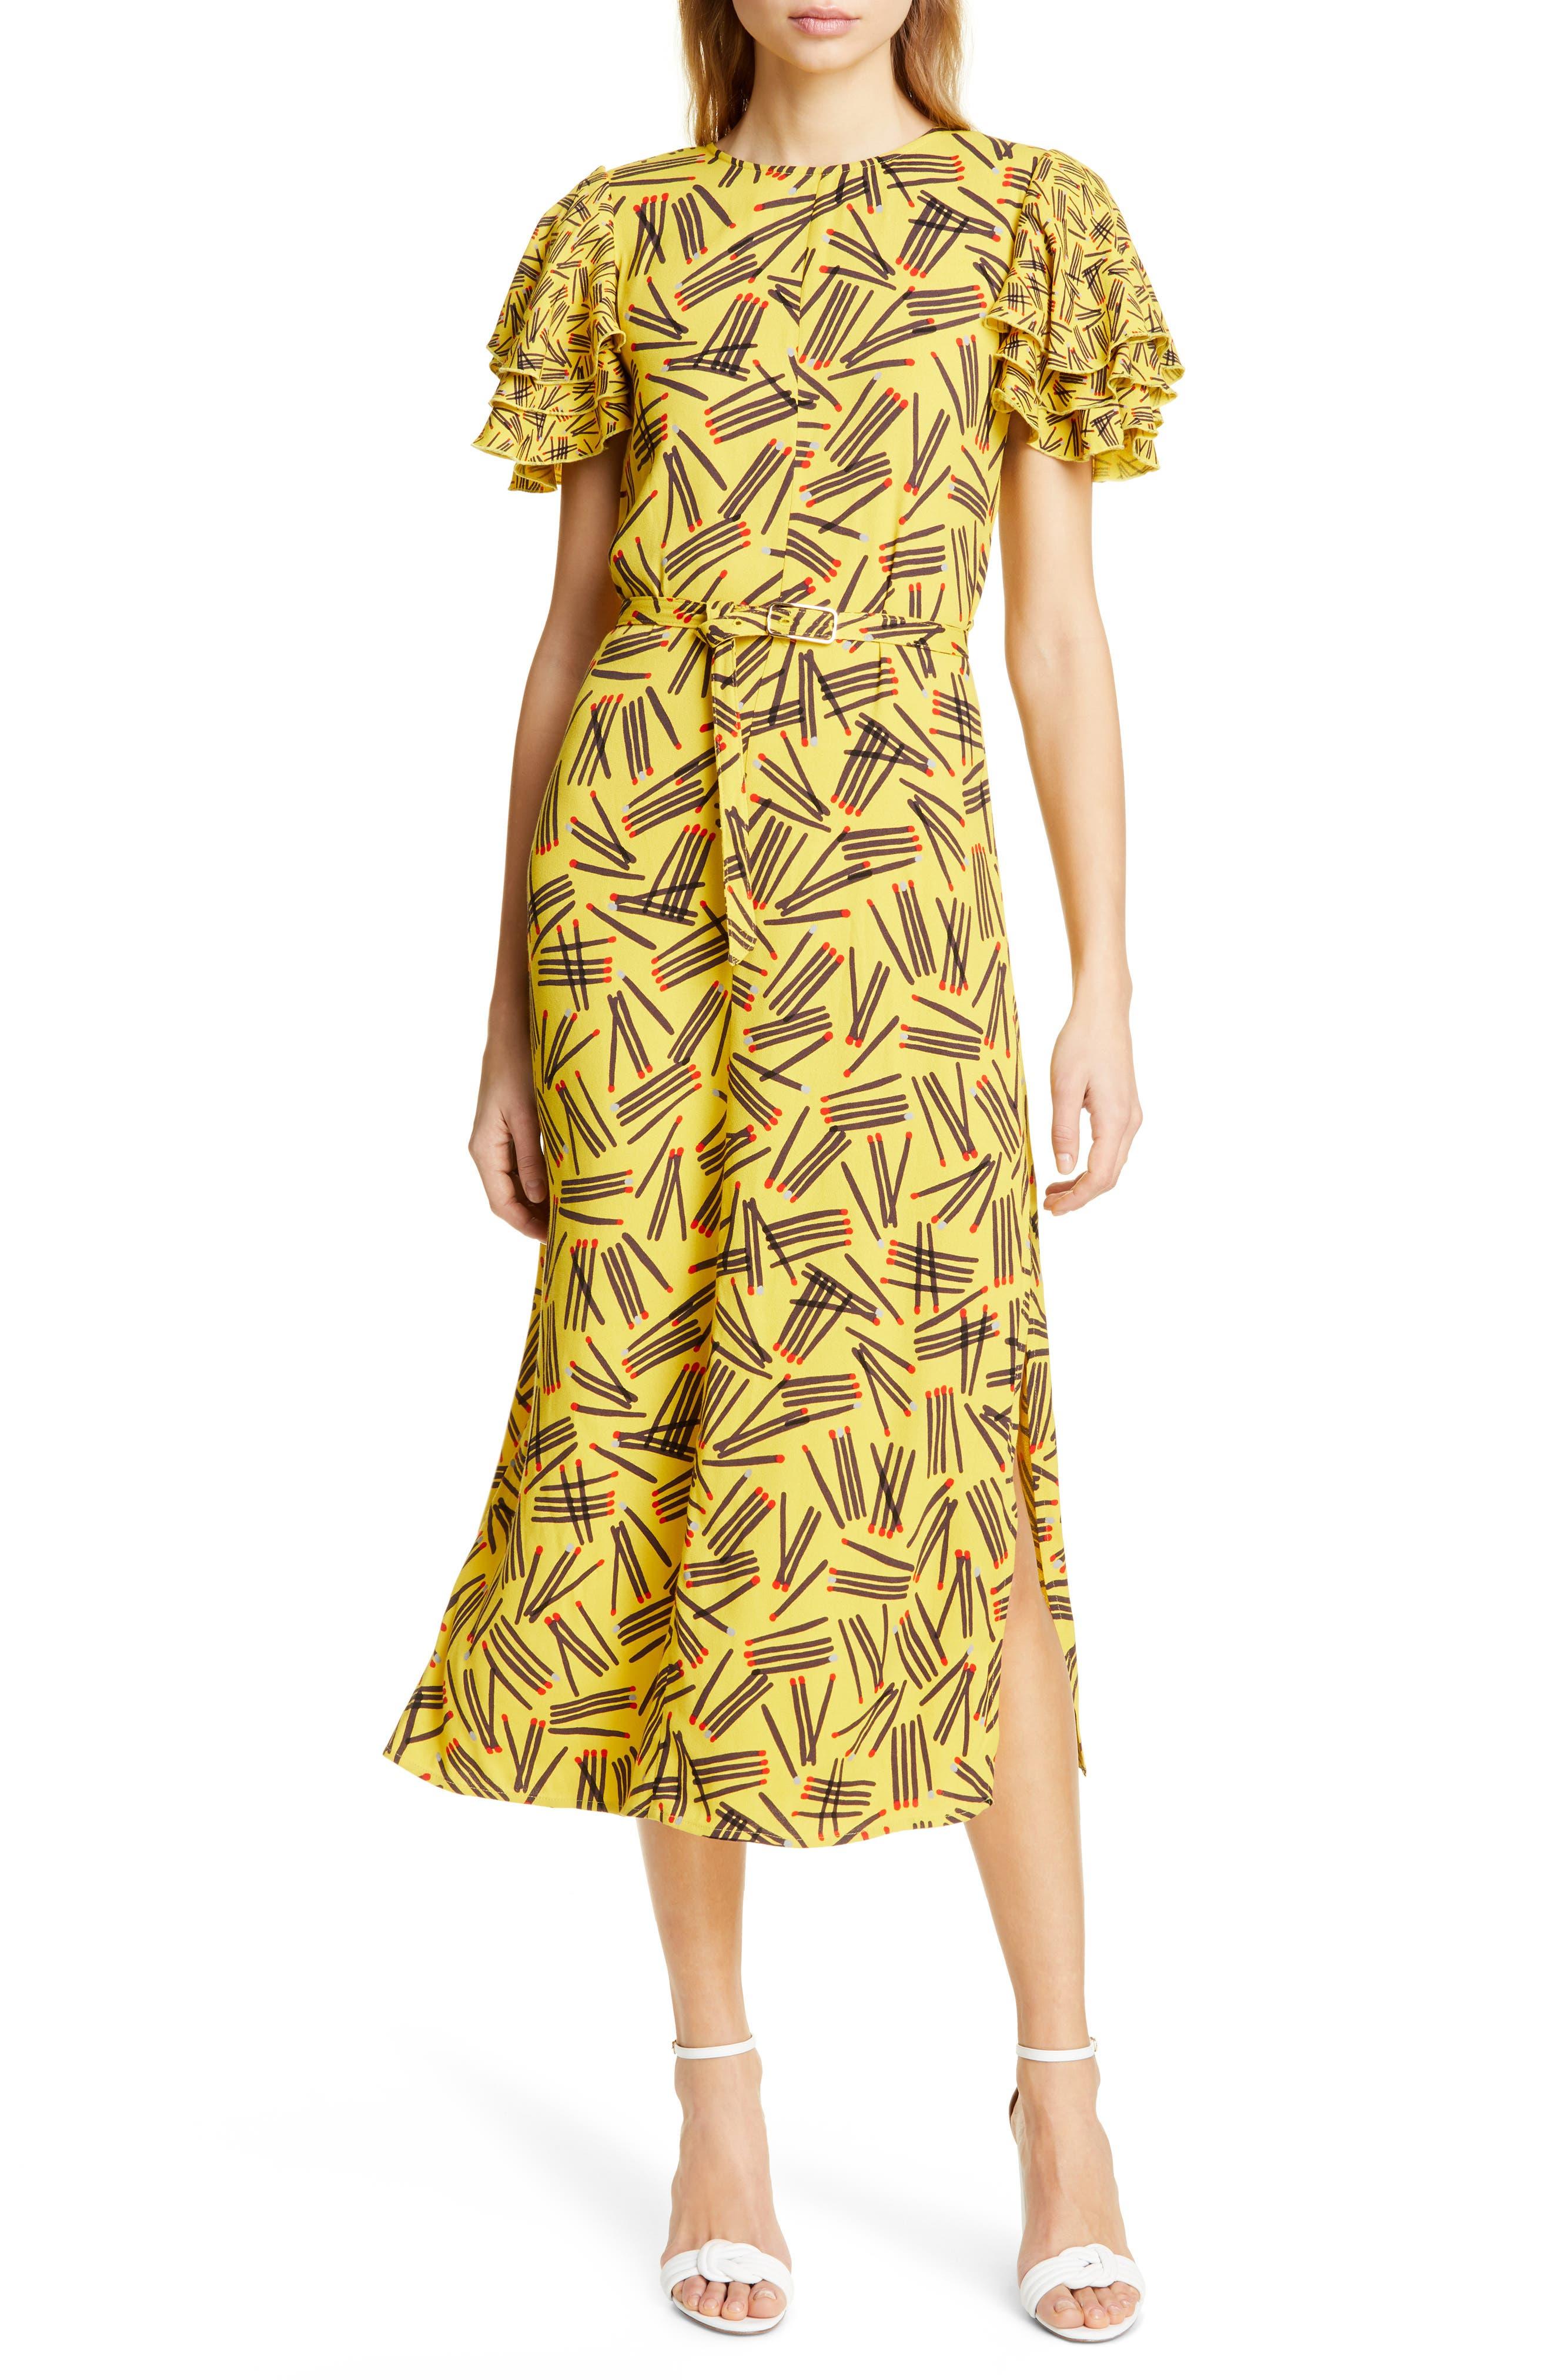 Kate Spade New York Matches Midi Dress, Yellow